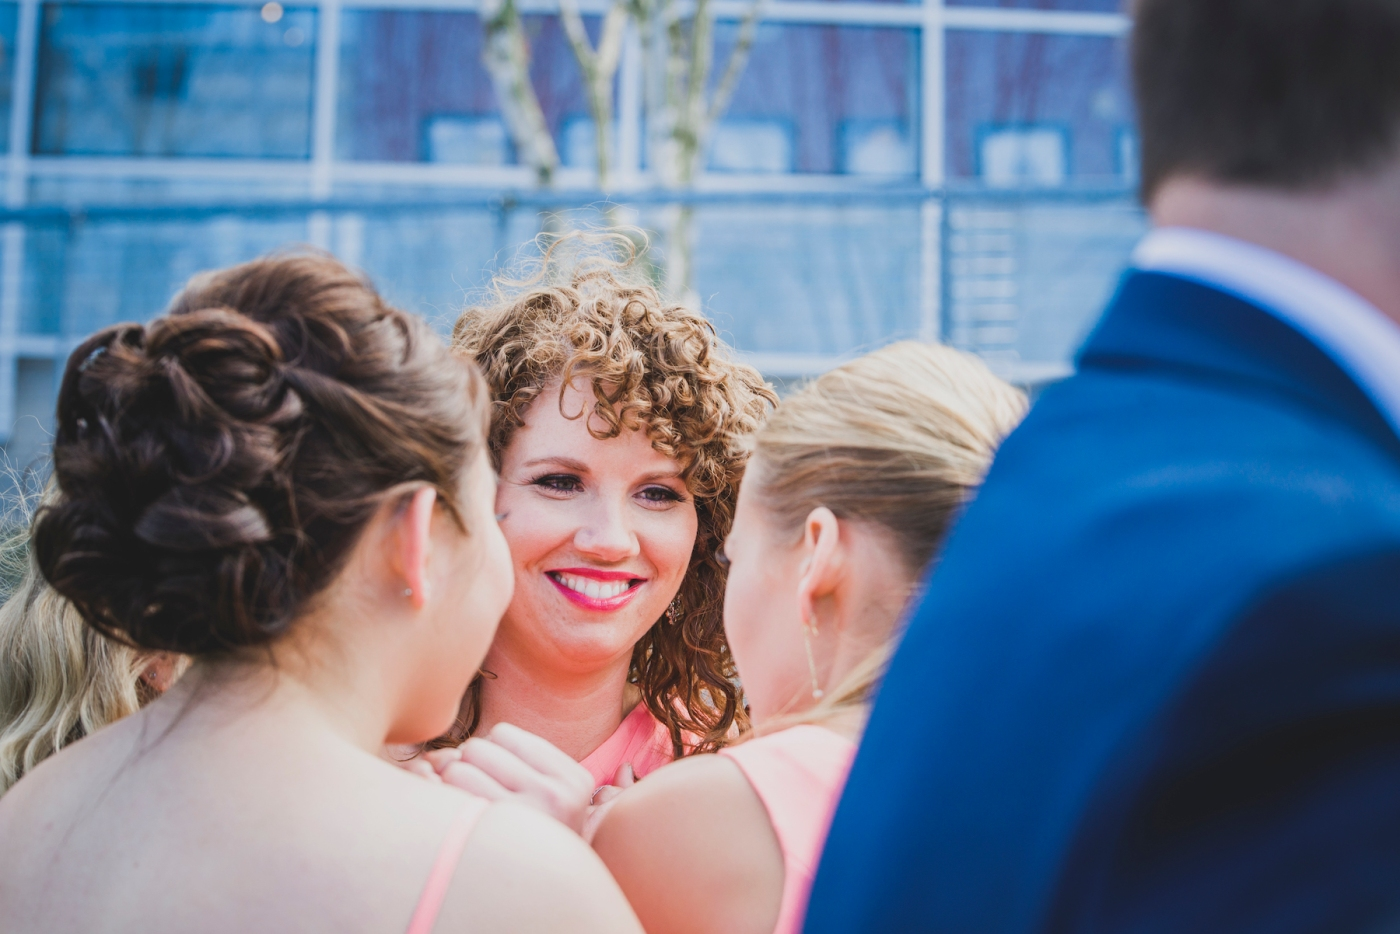 DSC_2277Everett_Wedding_Ballroom_Jane_Speleers_photography_Rachel_and_Edmund_Bridesmaids_peach_dresses_groomsmen_2017